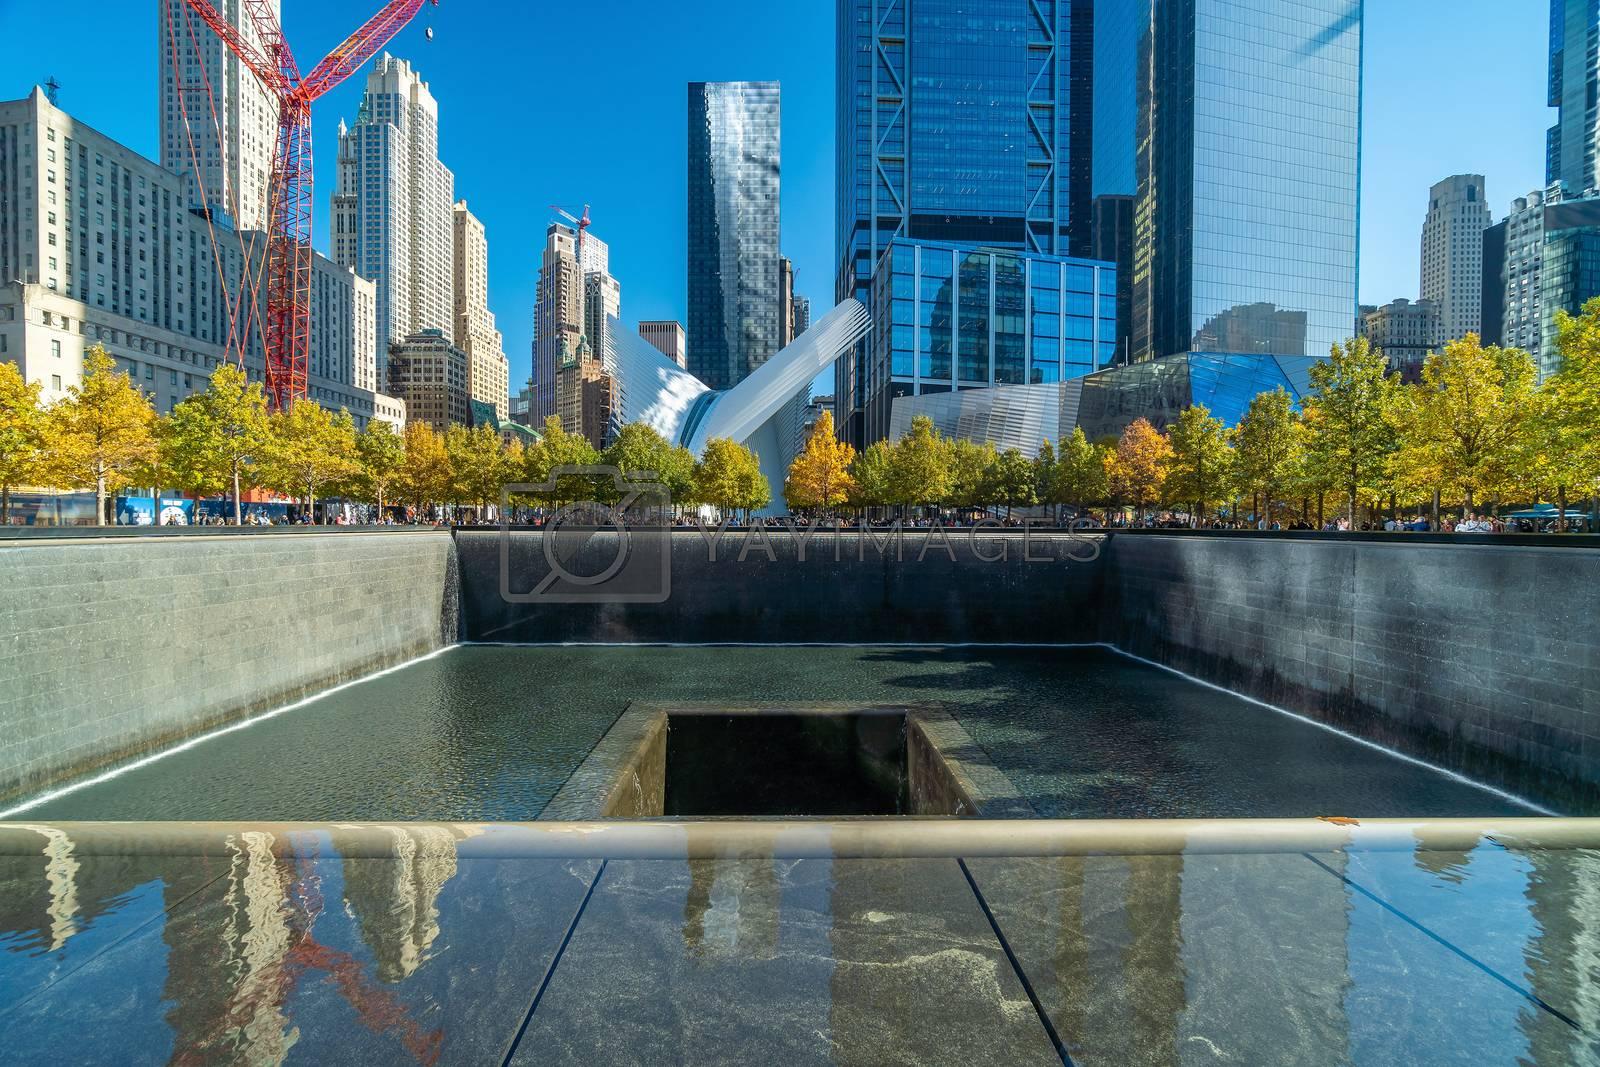 NEW YORK CITY - October 25, 2019 :  9/11 Memorial at World Trade Center Ground Zero in downtown Manhattan, NYC USA